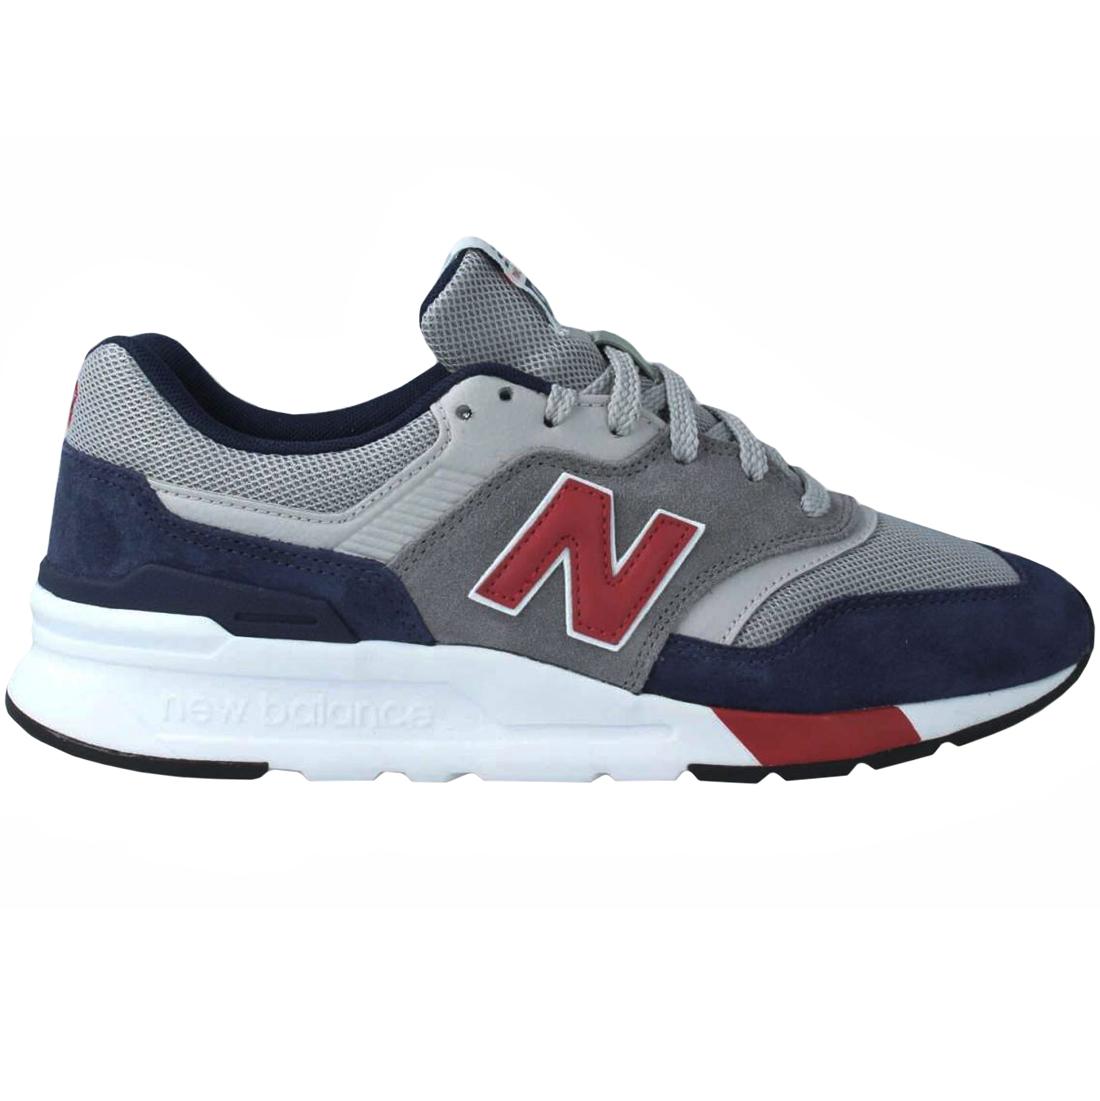 New Balance CM997HVR Sneaker grau blau rot